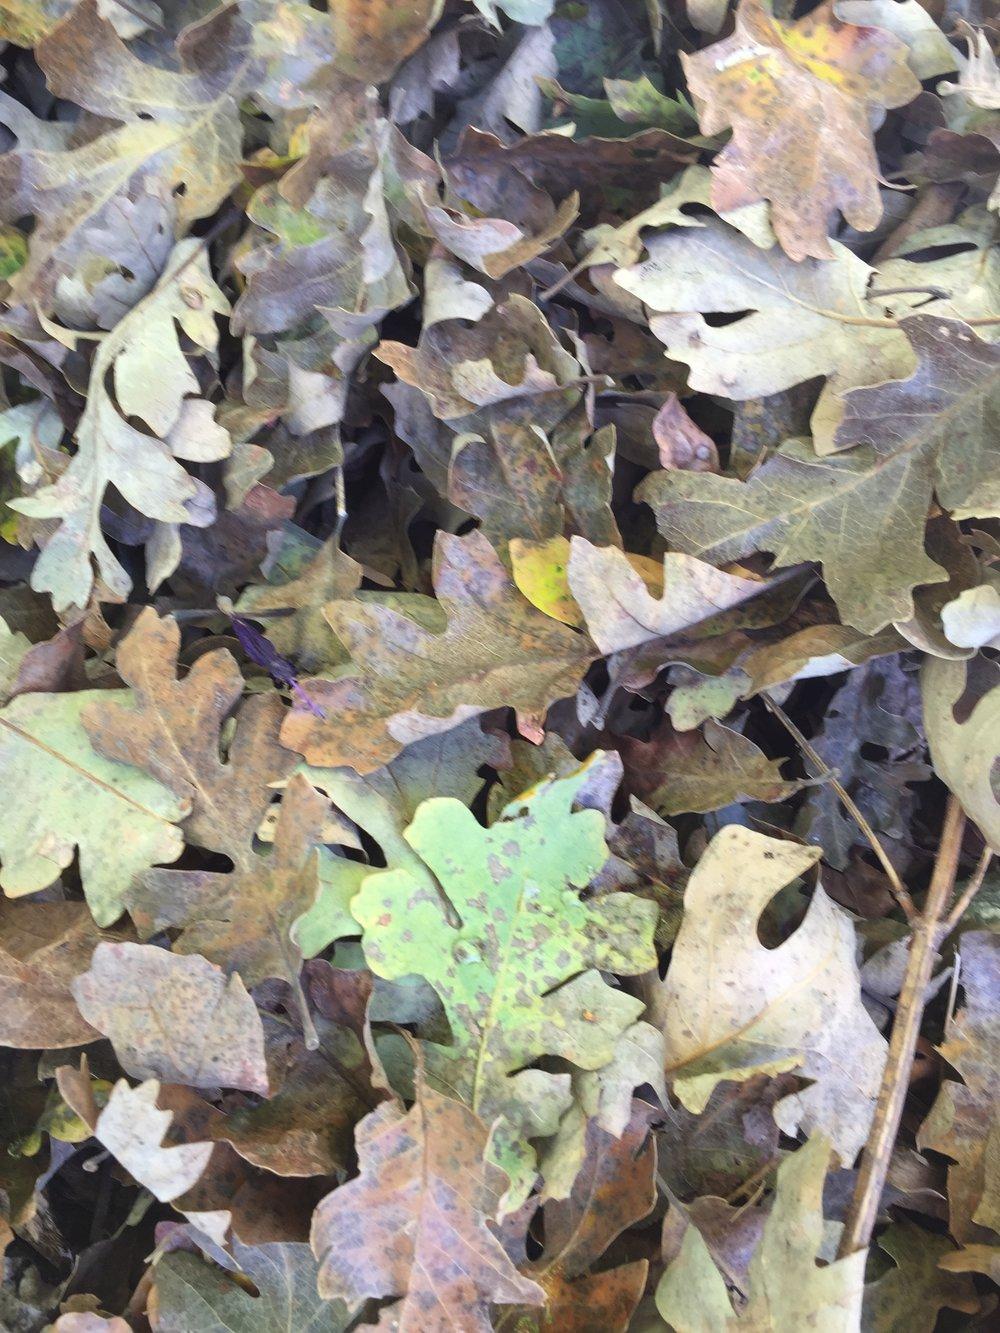 Valley Oak leaves in my driveway